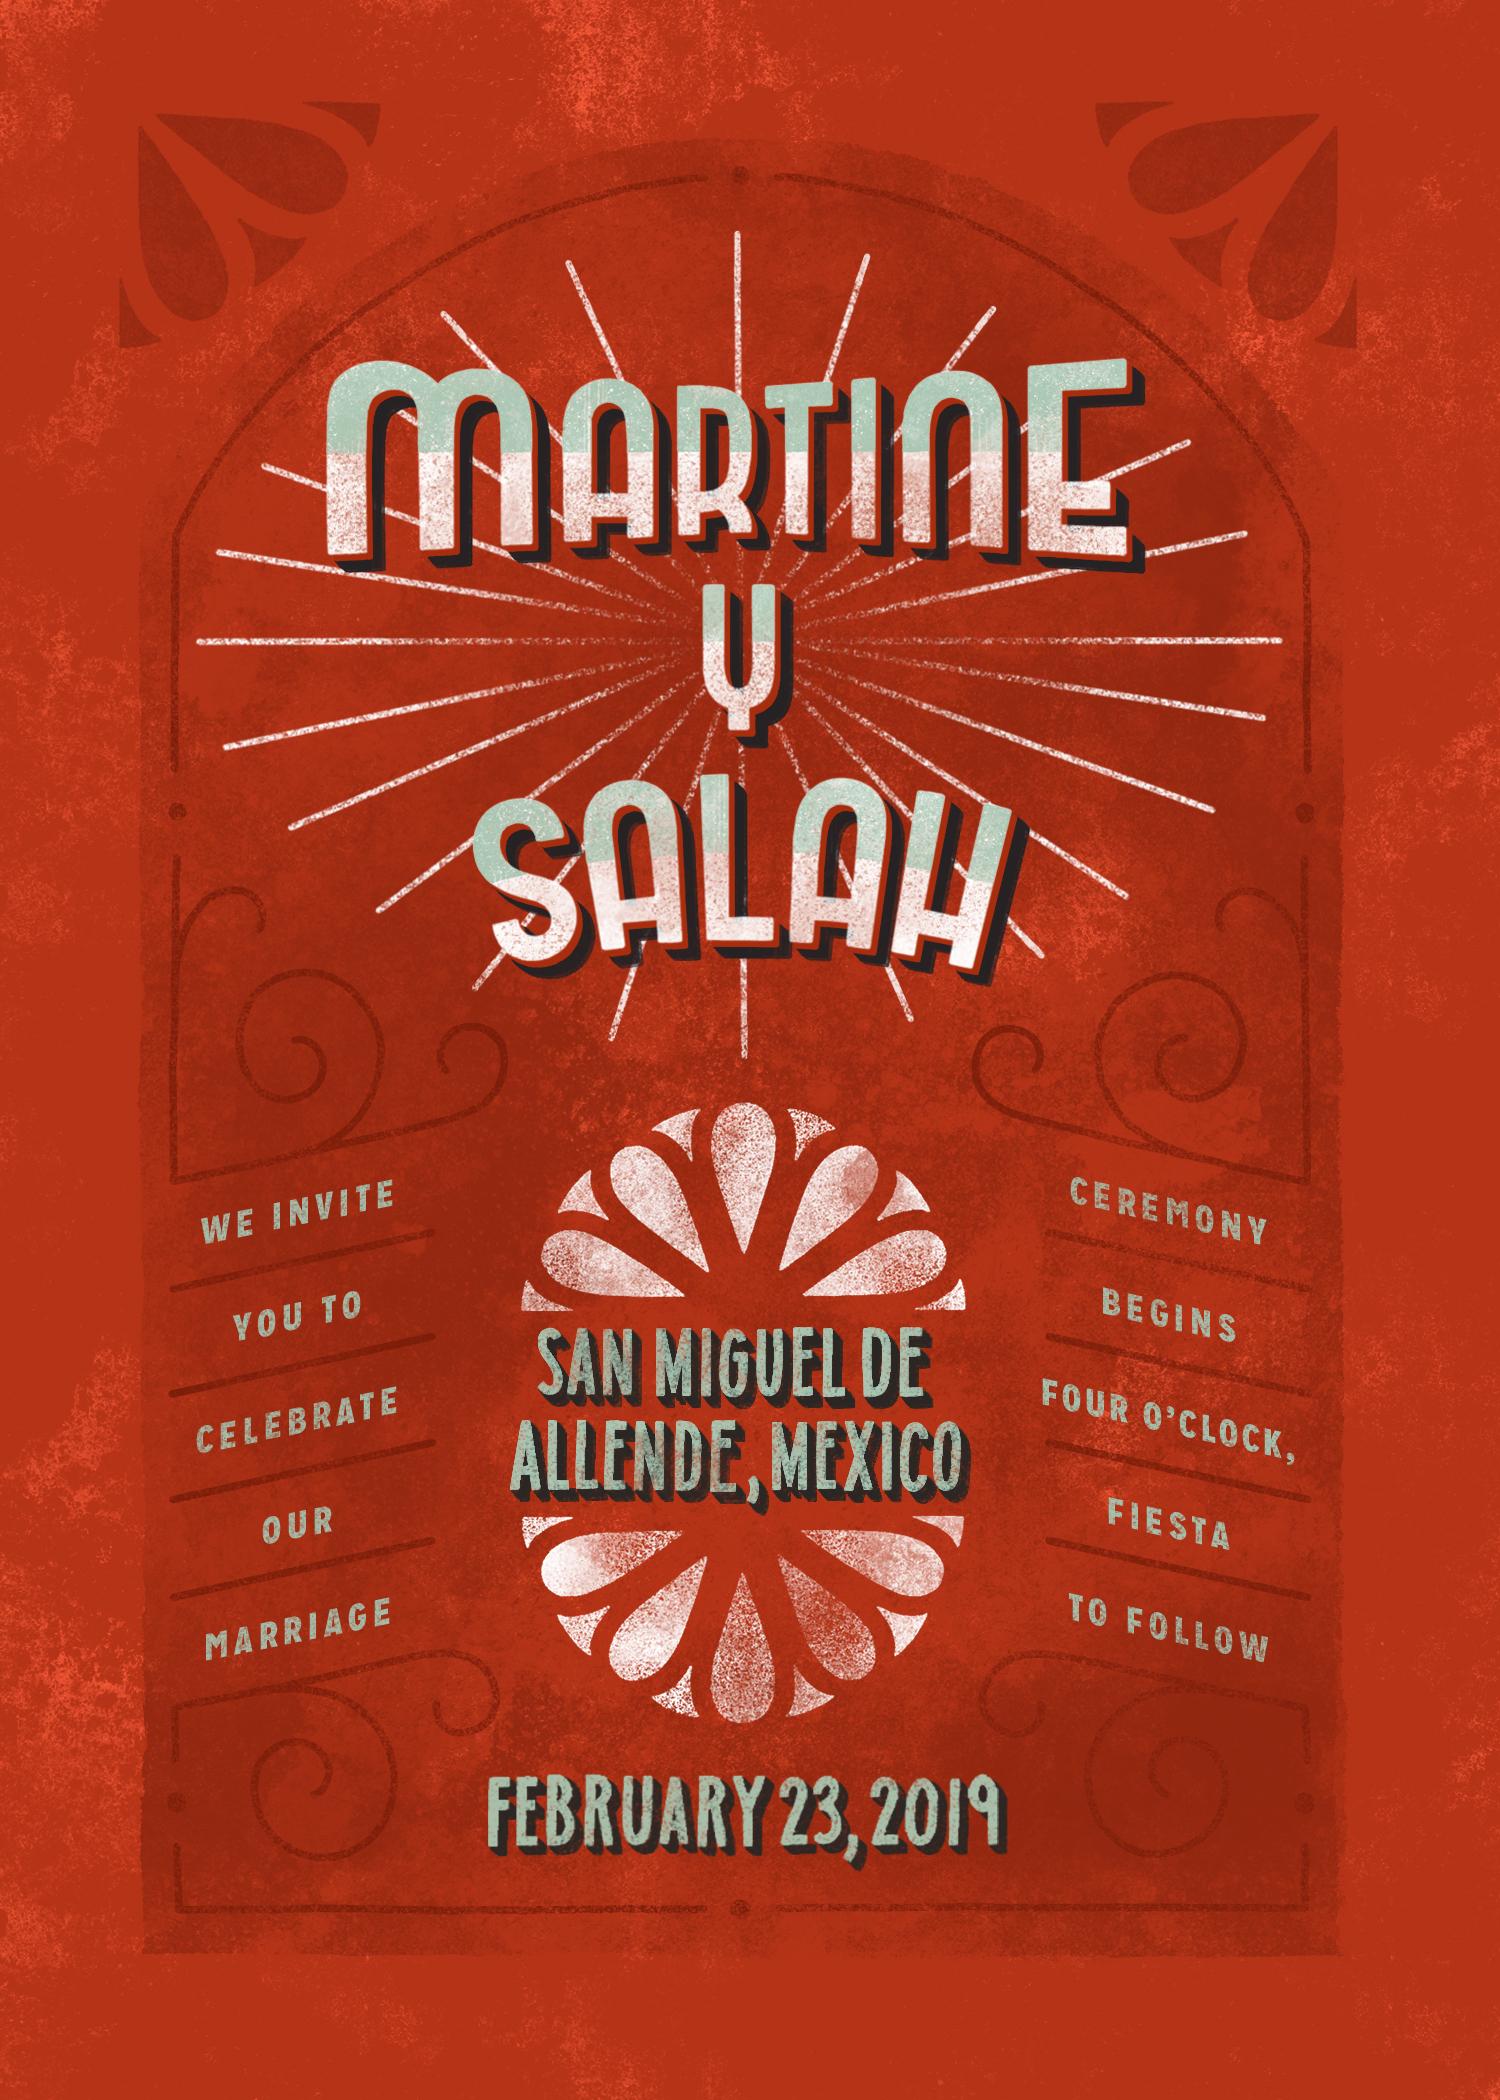 Martine Y Salah INVITATION FINAL.jpg